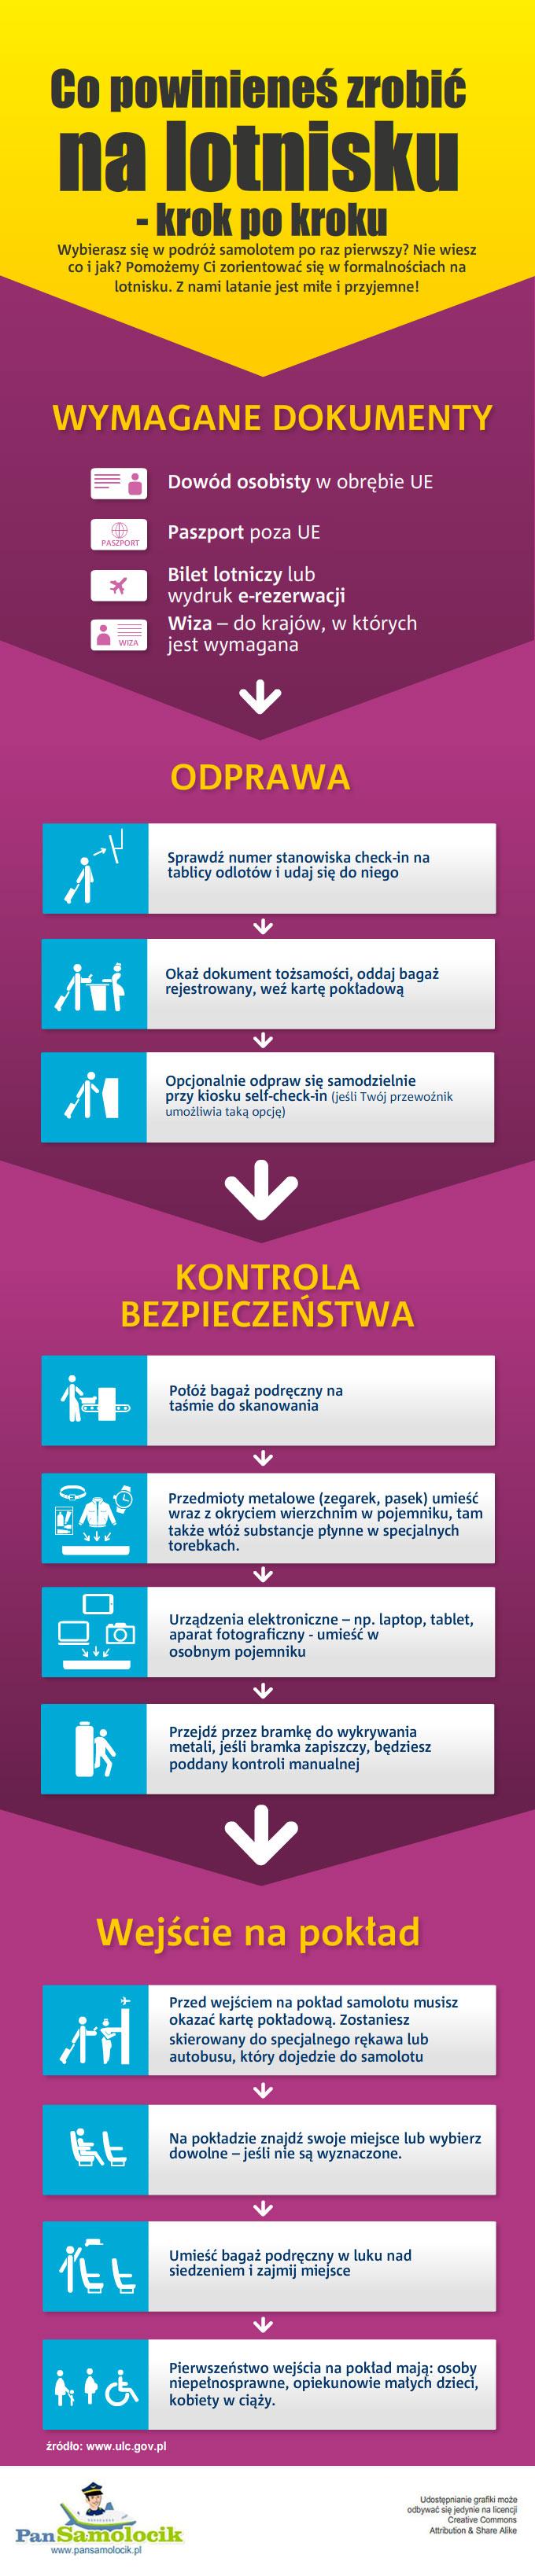 Infografika - na lotnisku krok po kroku